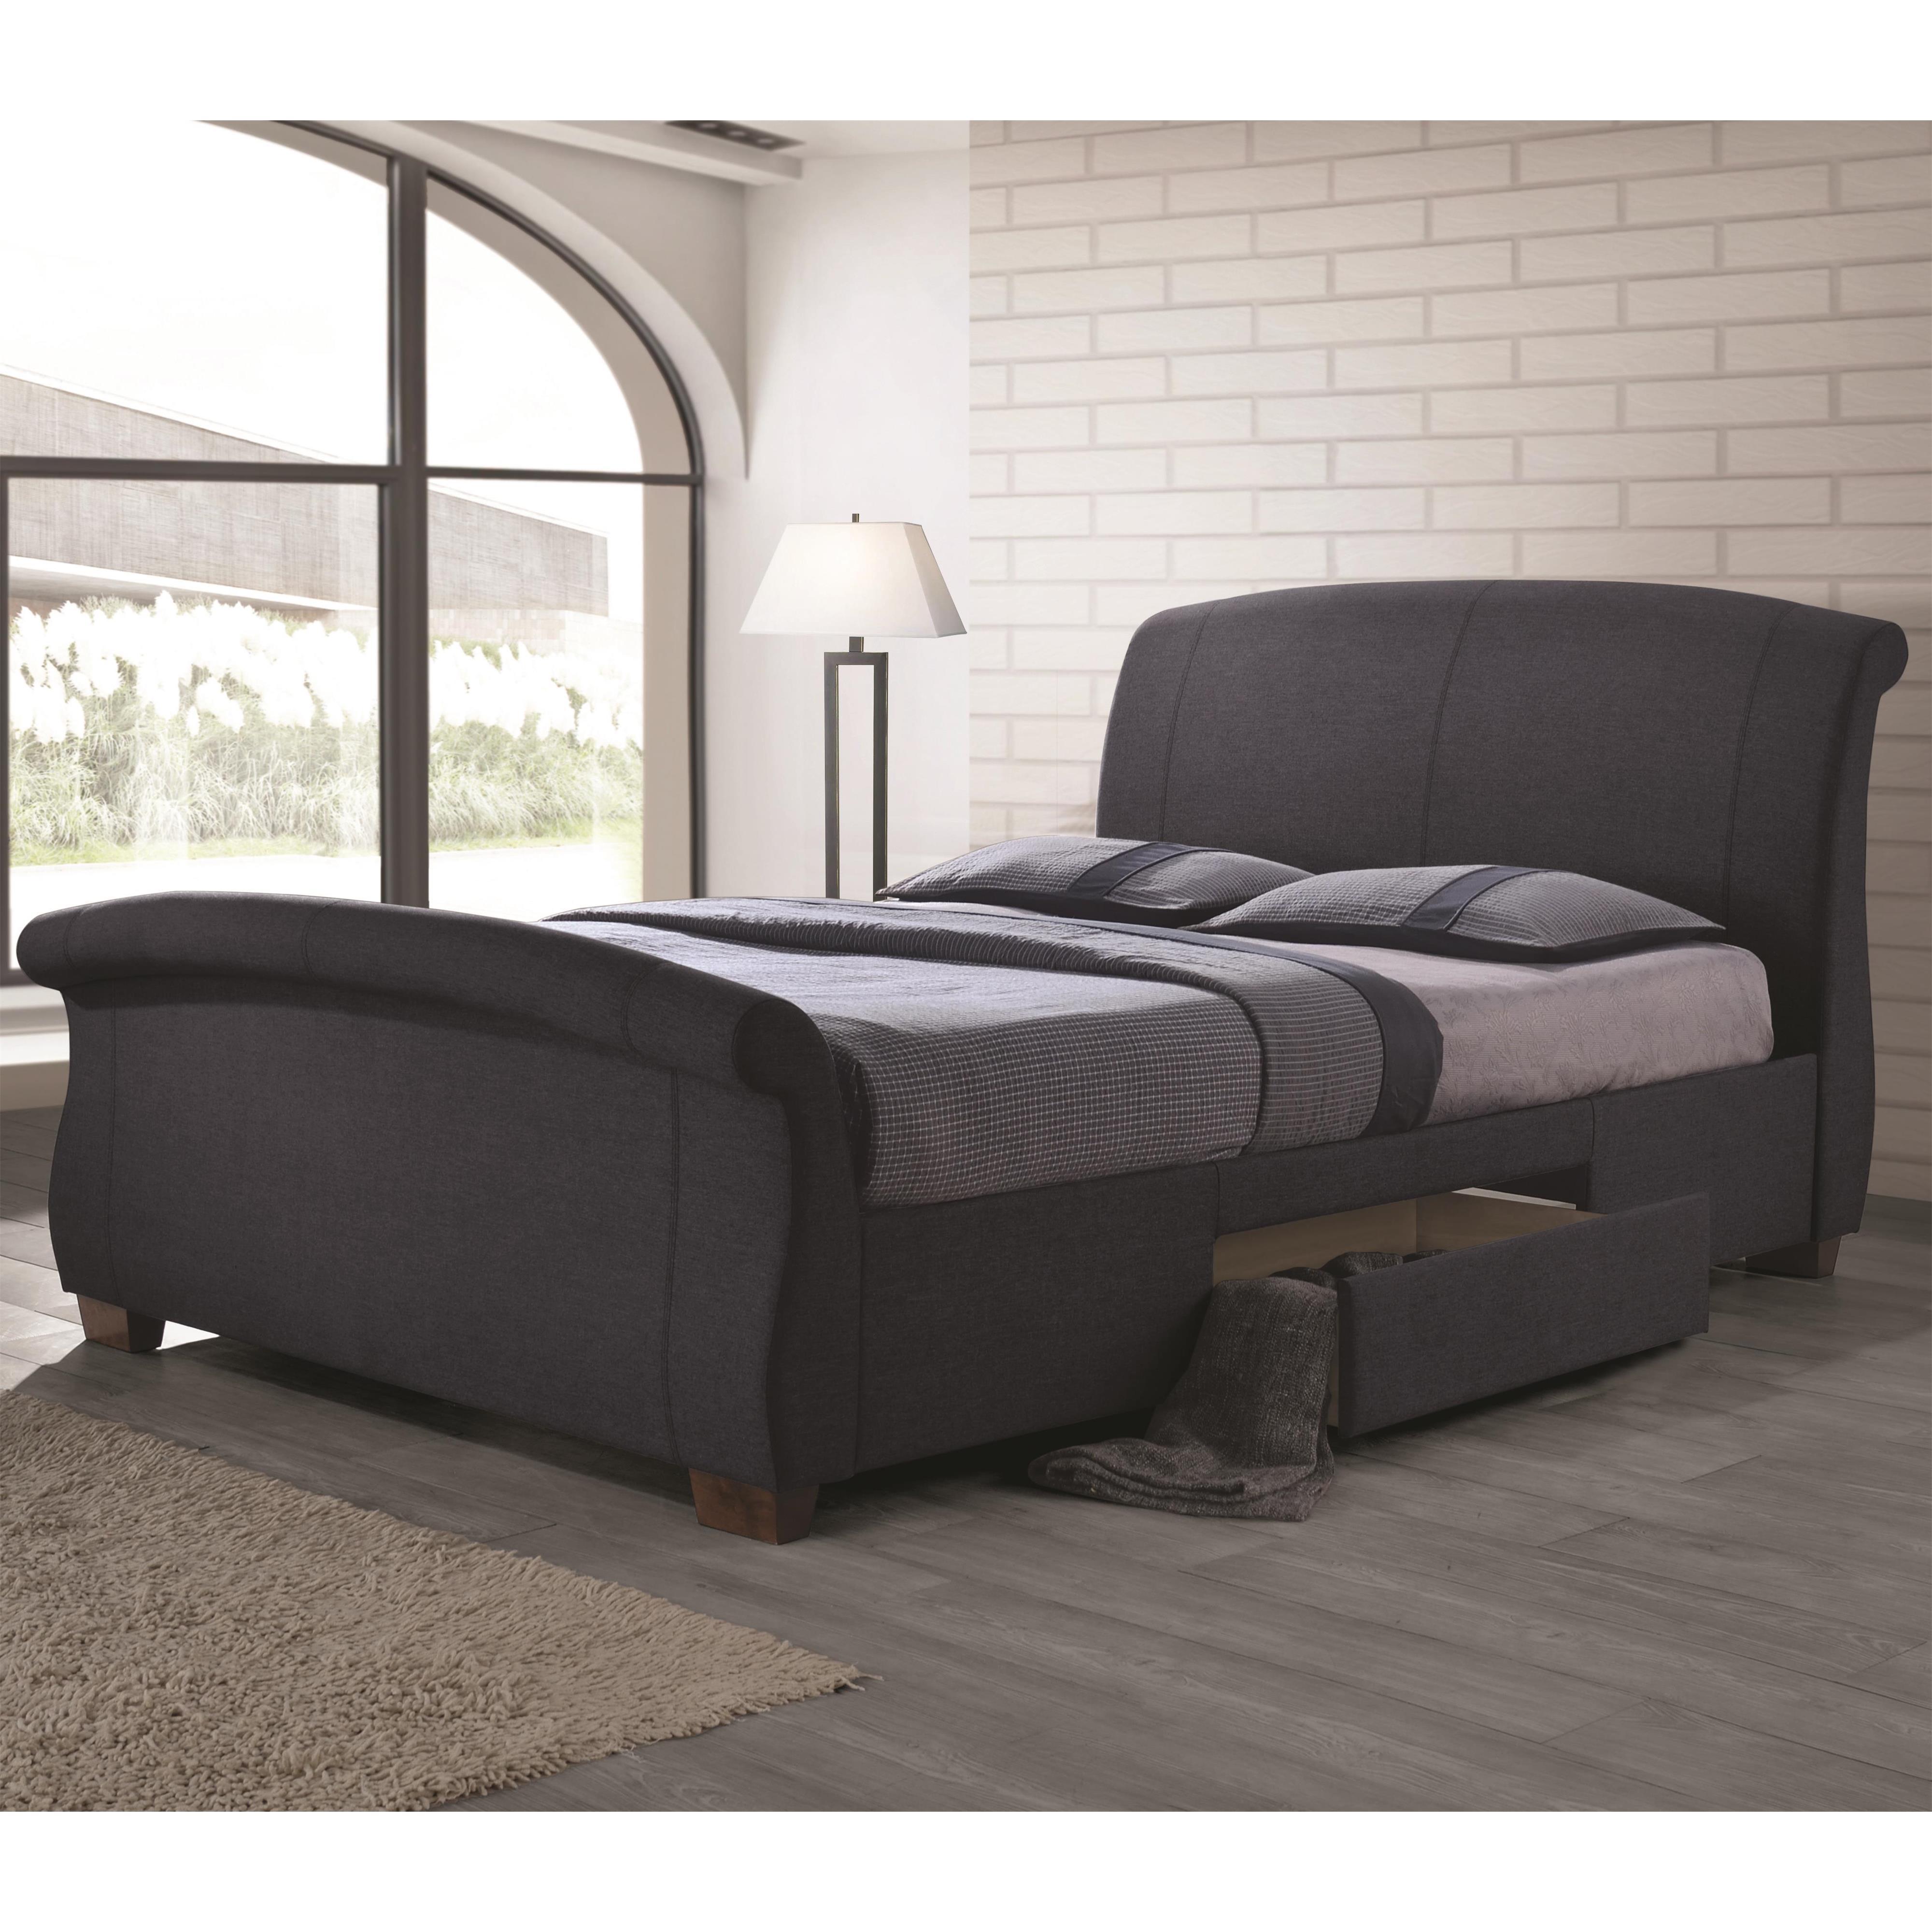 Coaster Bristol Fully Upholstered California King Bed - Item Number: 300524KW